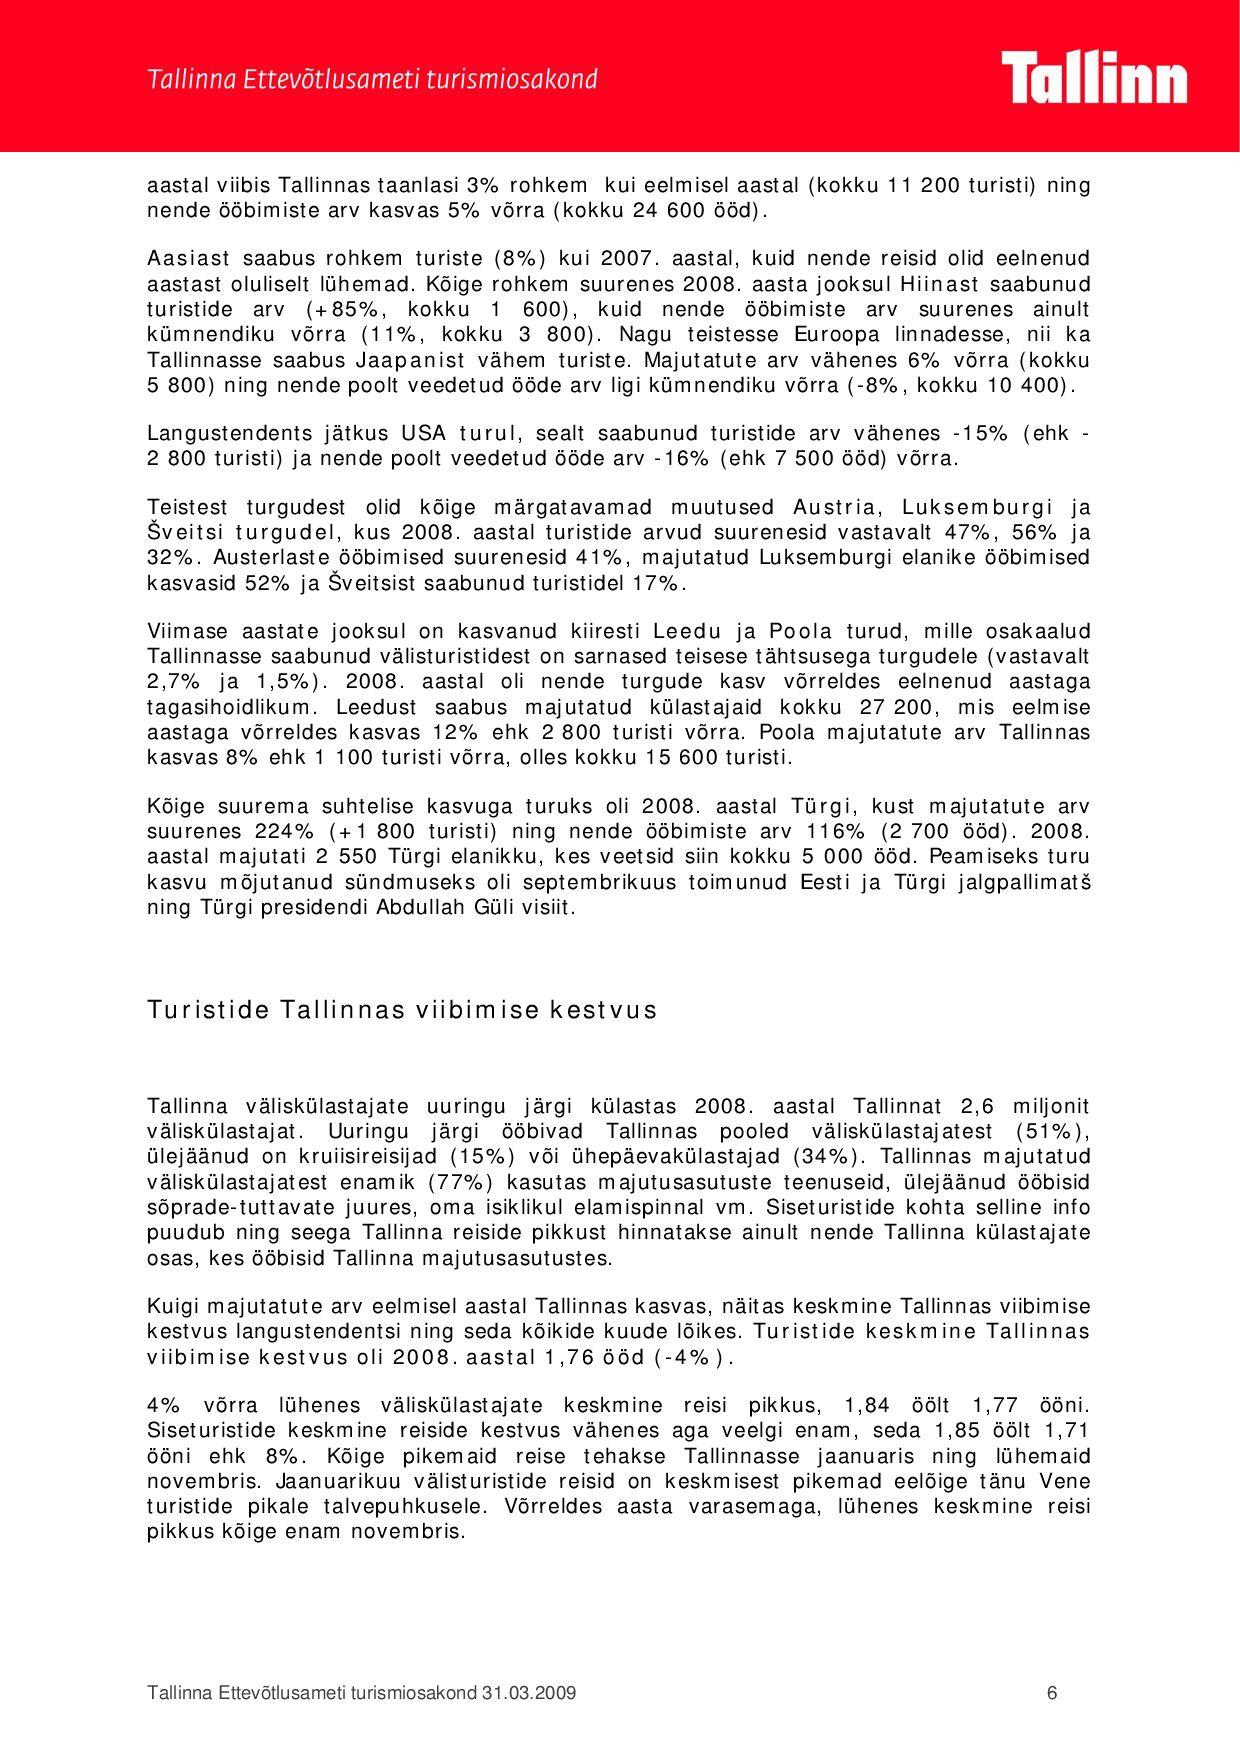 de7f7a983c3 Tallinna Ettevõtlusameti turismiosakond by Tallinn City Tourist Office &  Convention Bureau - issuu